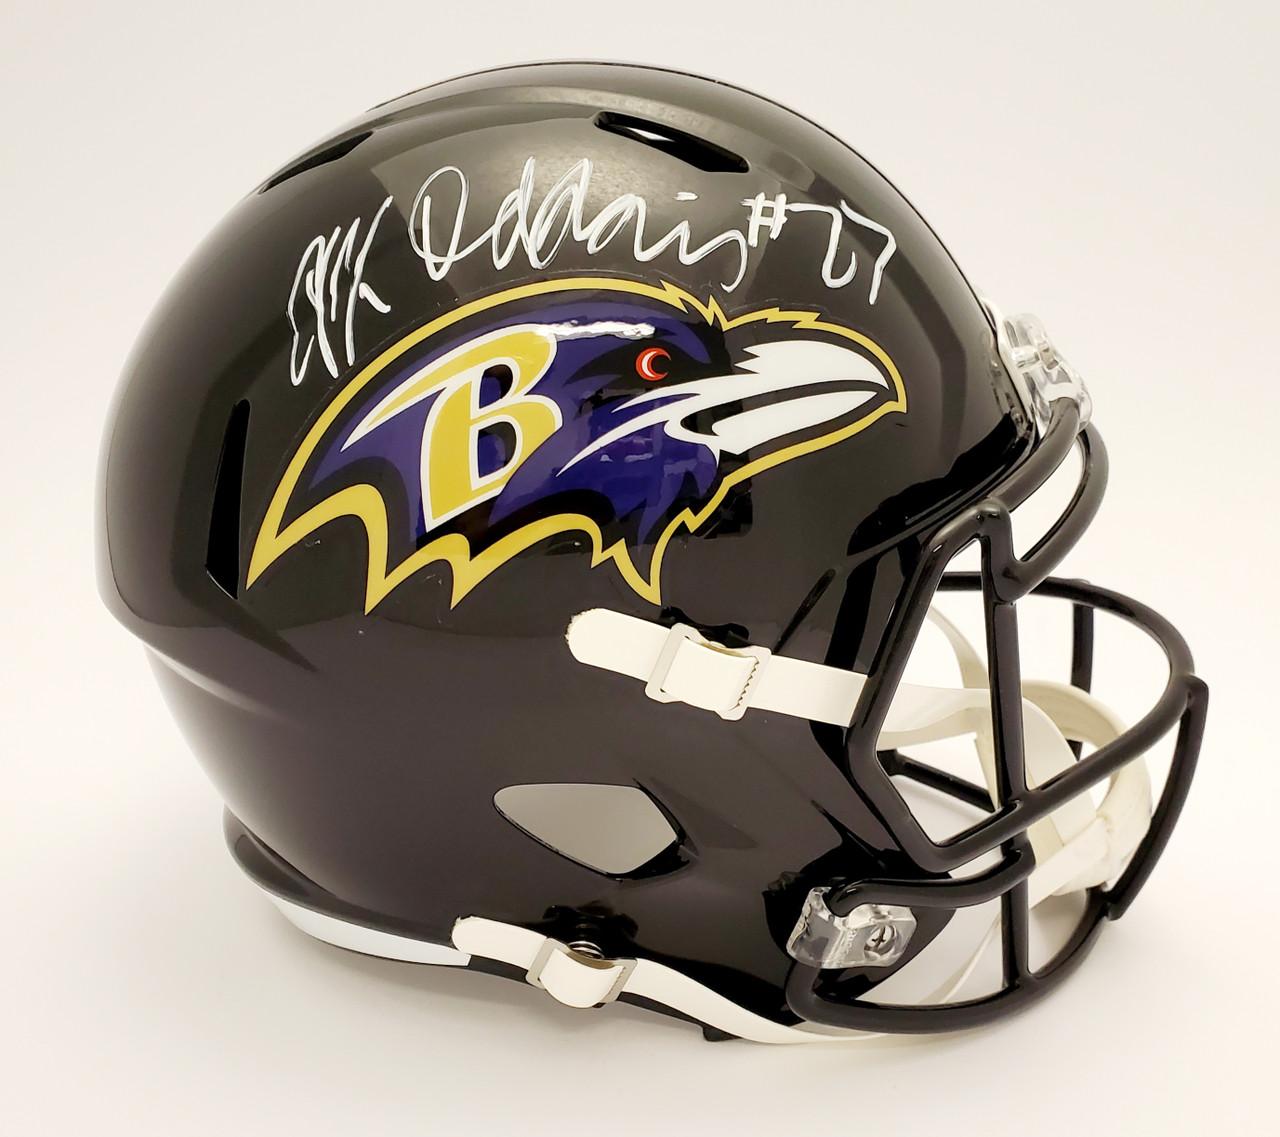 JK Dobbins Baltimore Ravens Autographed Replica Helmet - JSA Authentic